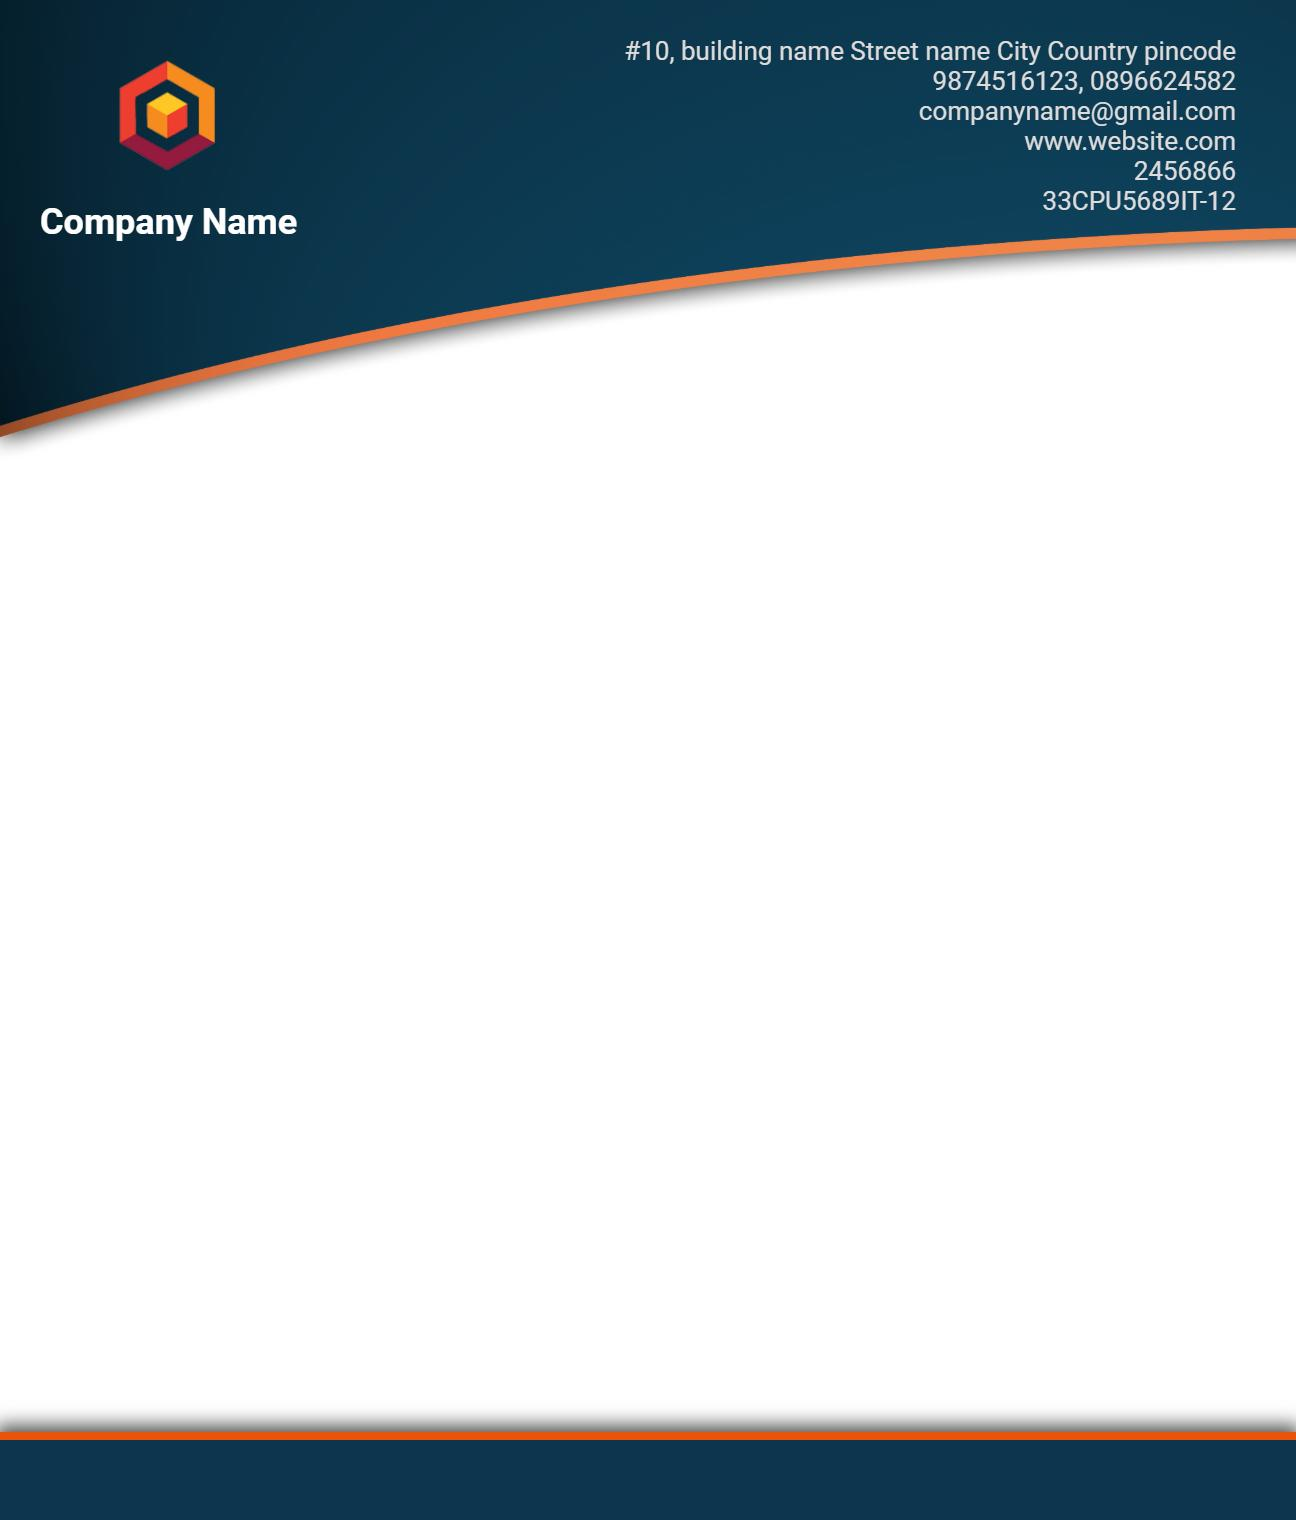 Download Template Kop Surat Perusahaan Gratis